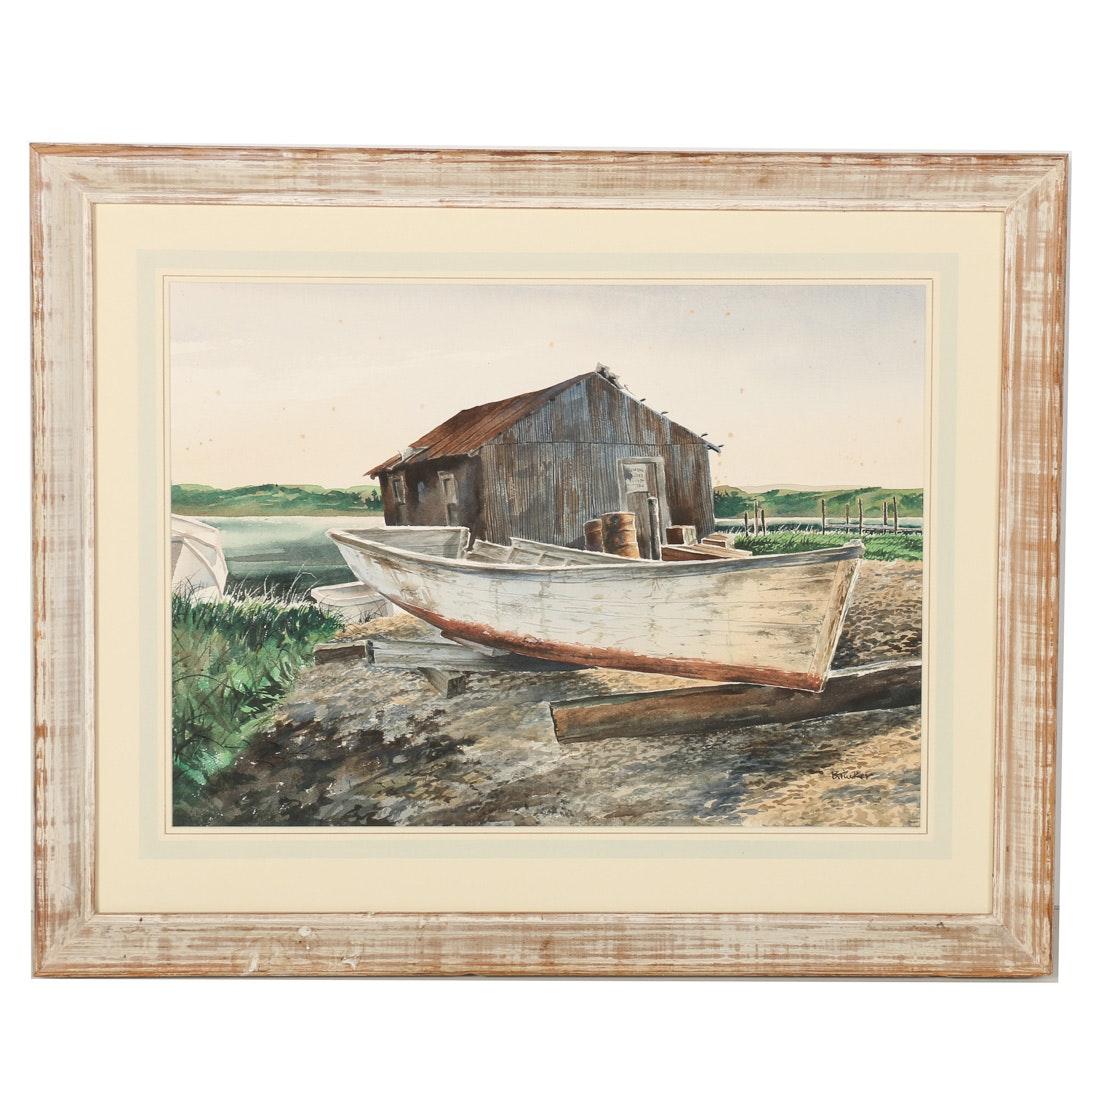 B. Tucker Signed Landscape Watercolor